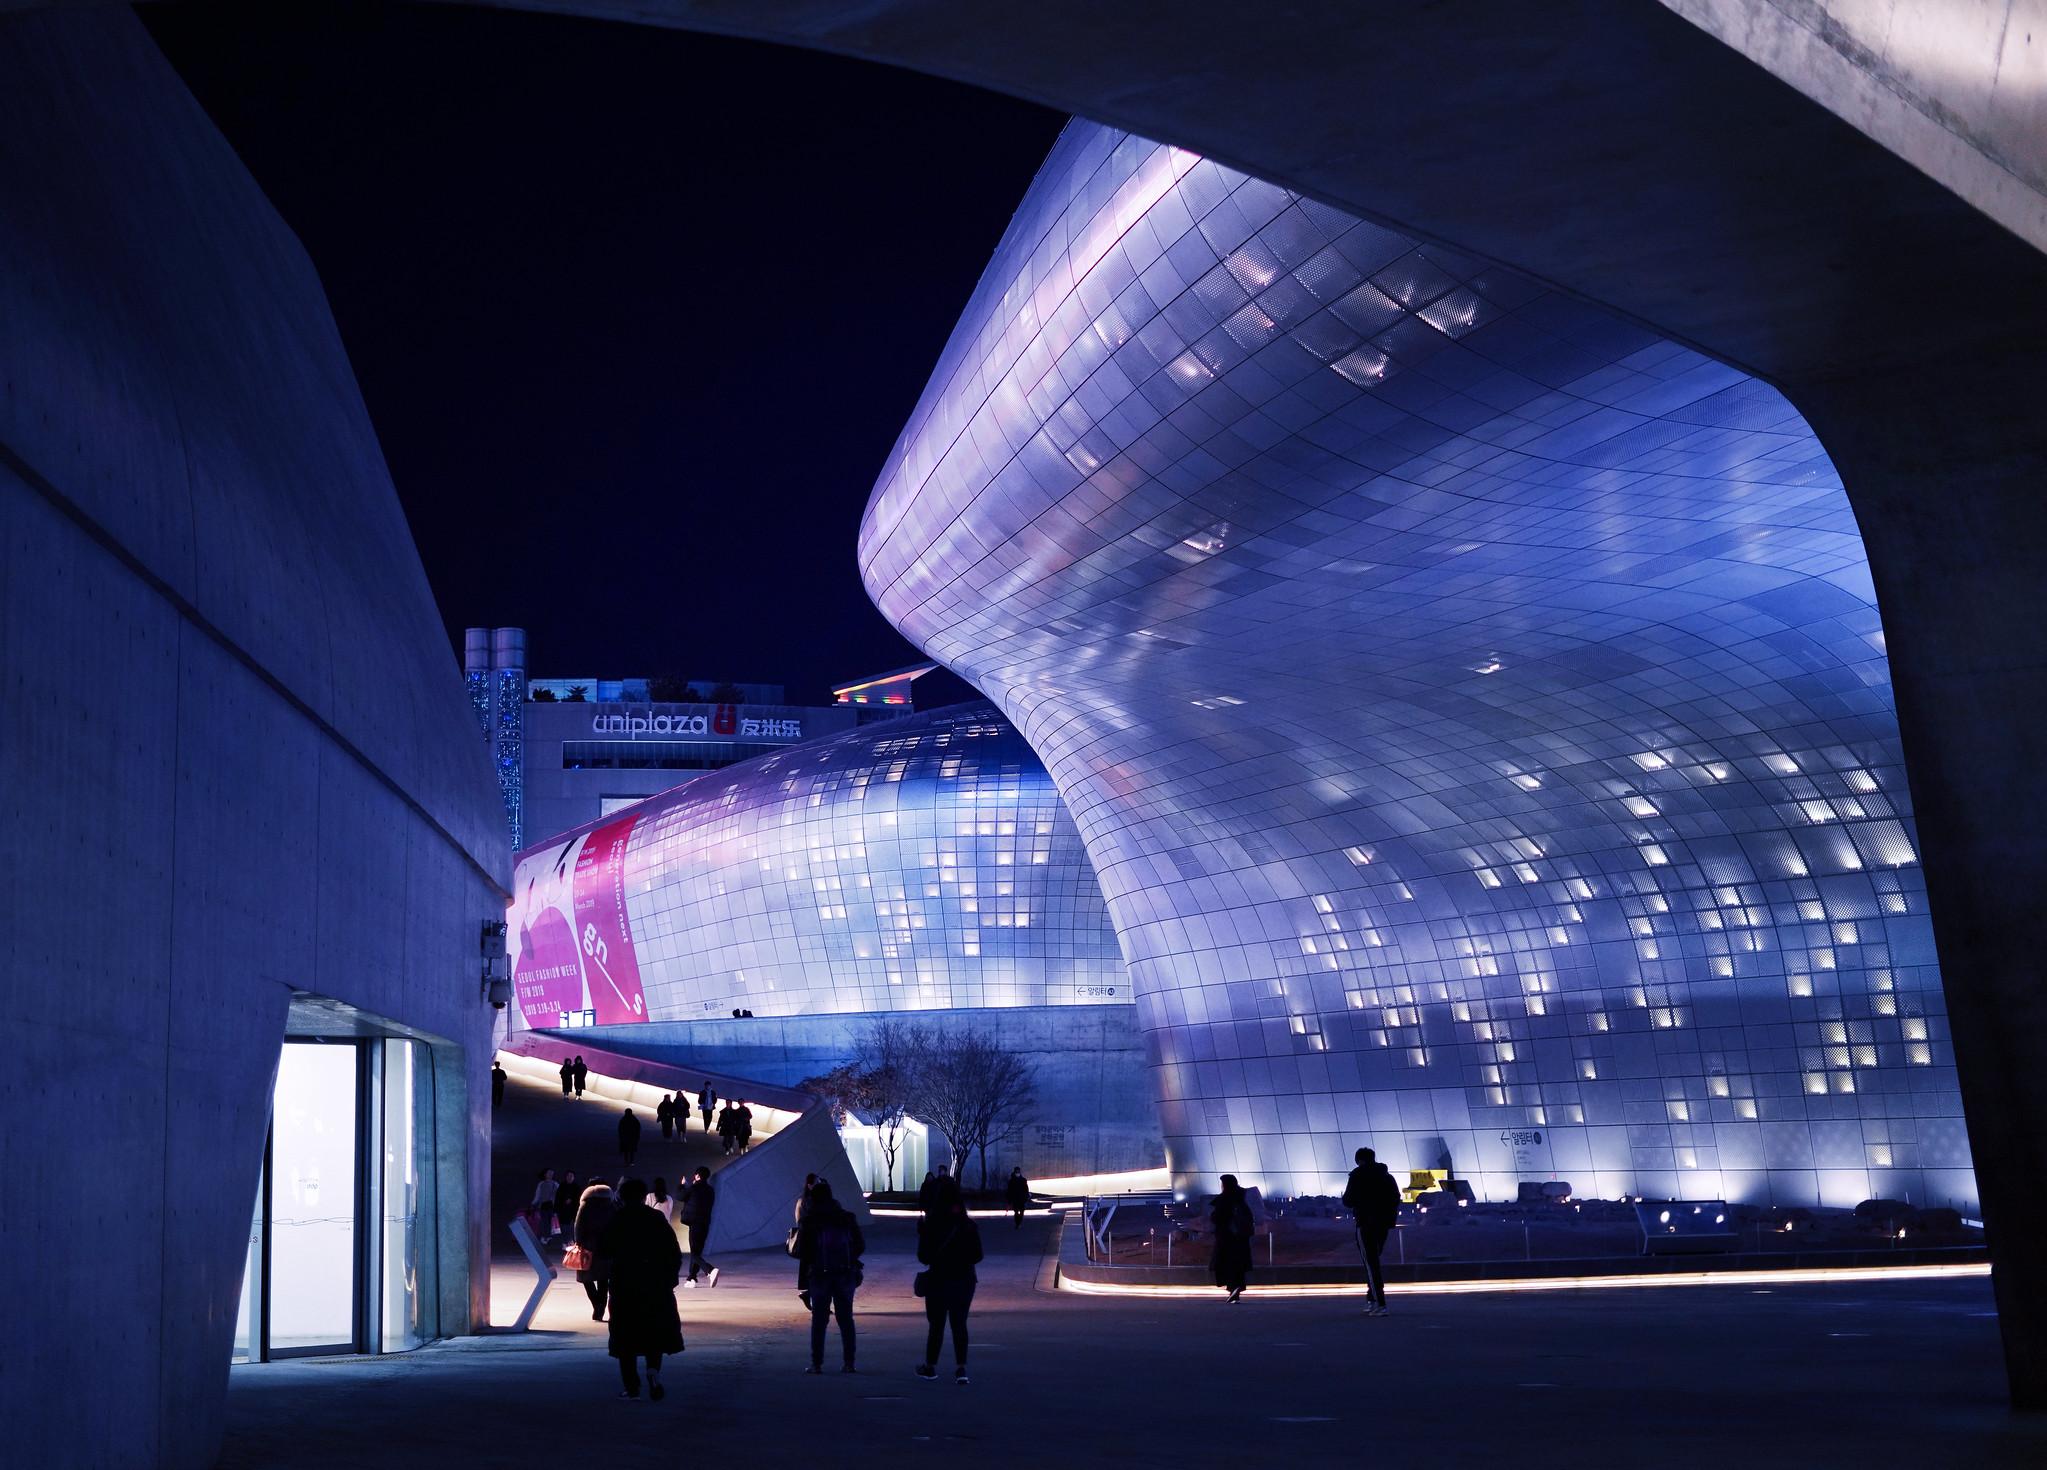 Dongdaemun design plaza ddp futuristic building synth wave